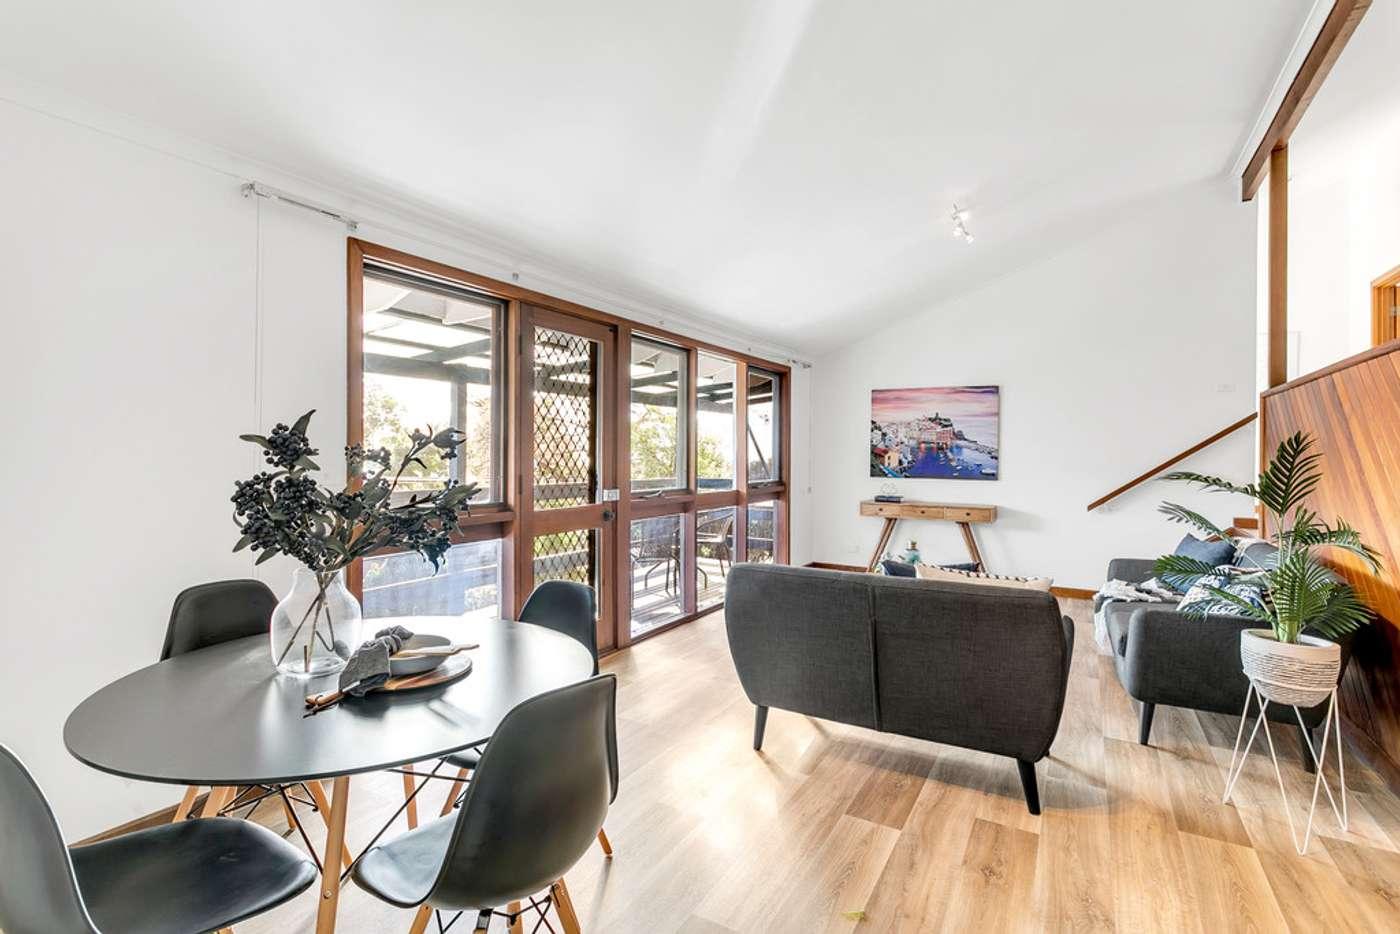 Sixth view of Homely house listing, 20 Wandilla Street, Seaview Downs SA 5049